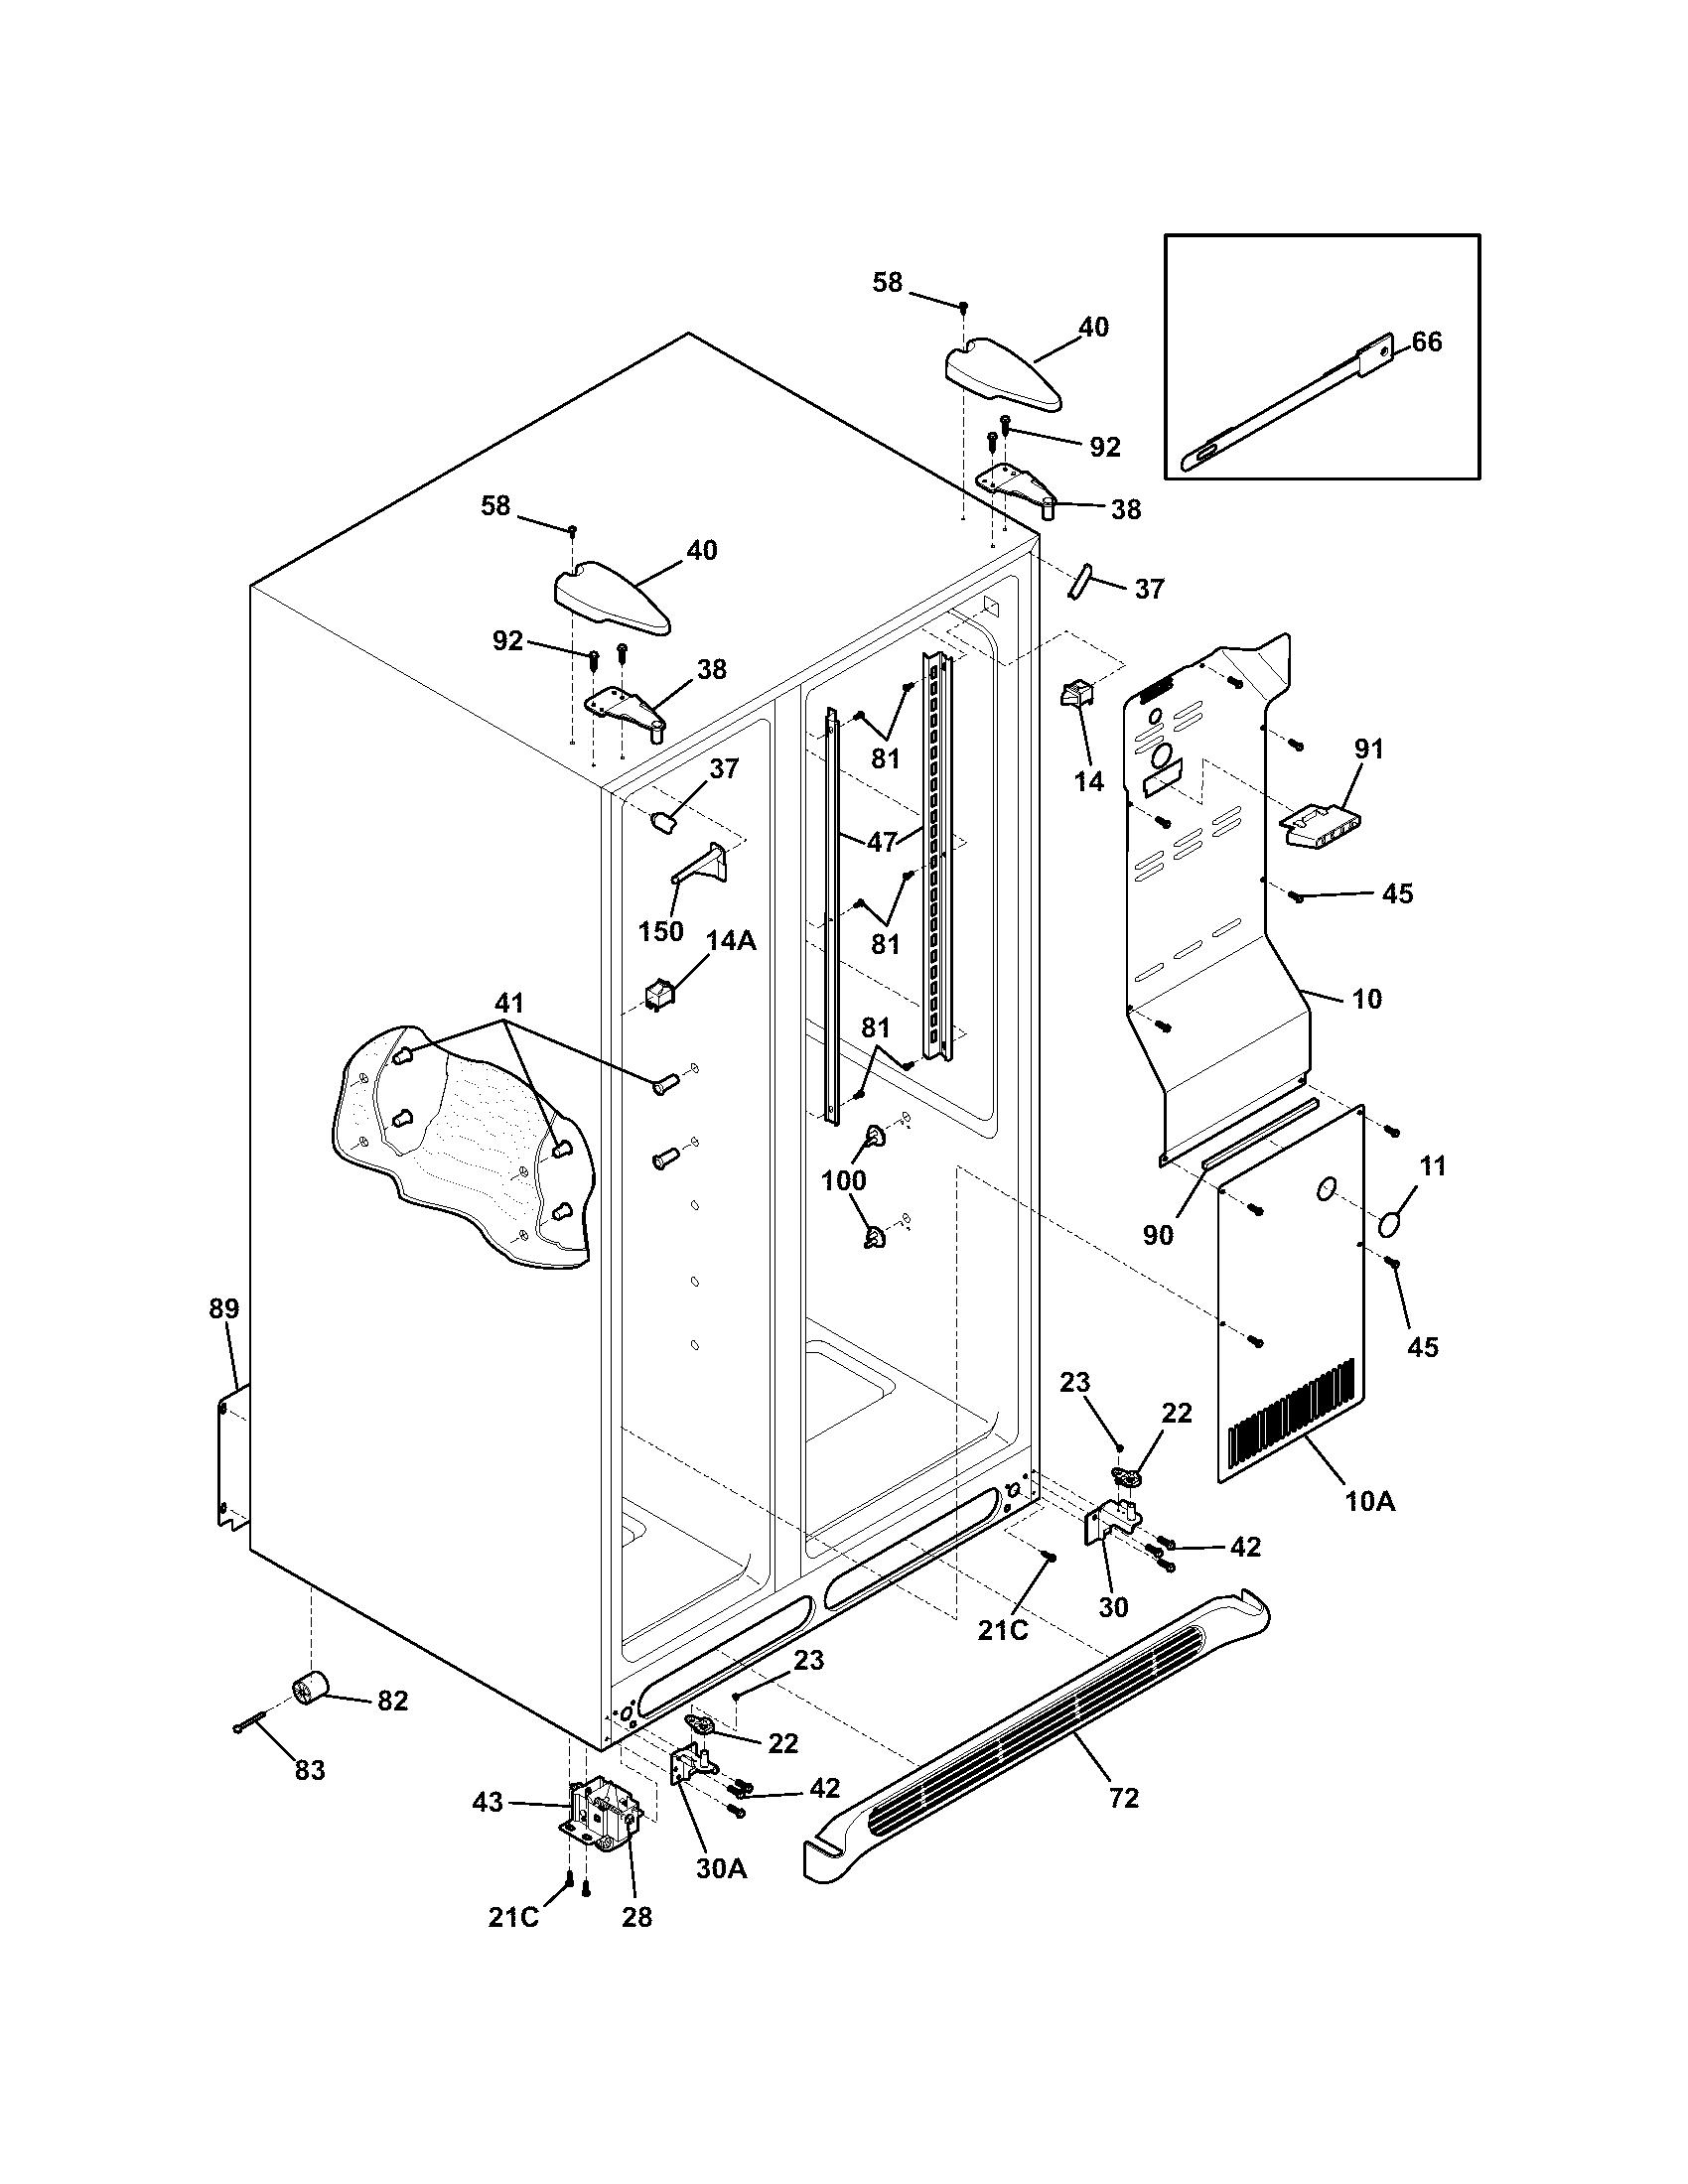 frigidaire fac107p1a2 wiring diagram